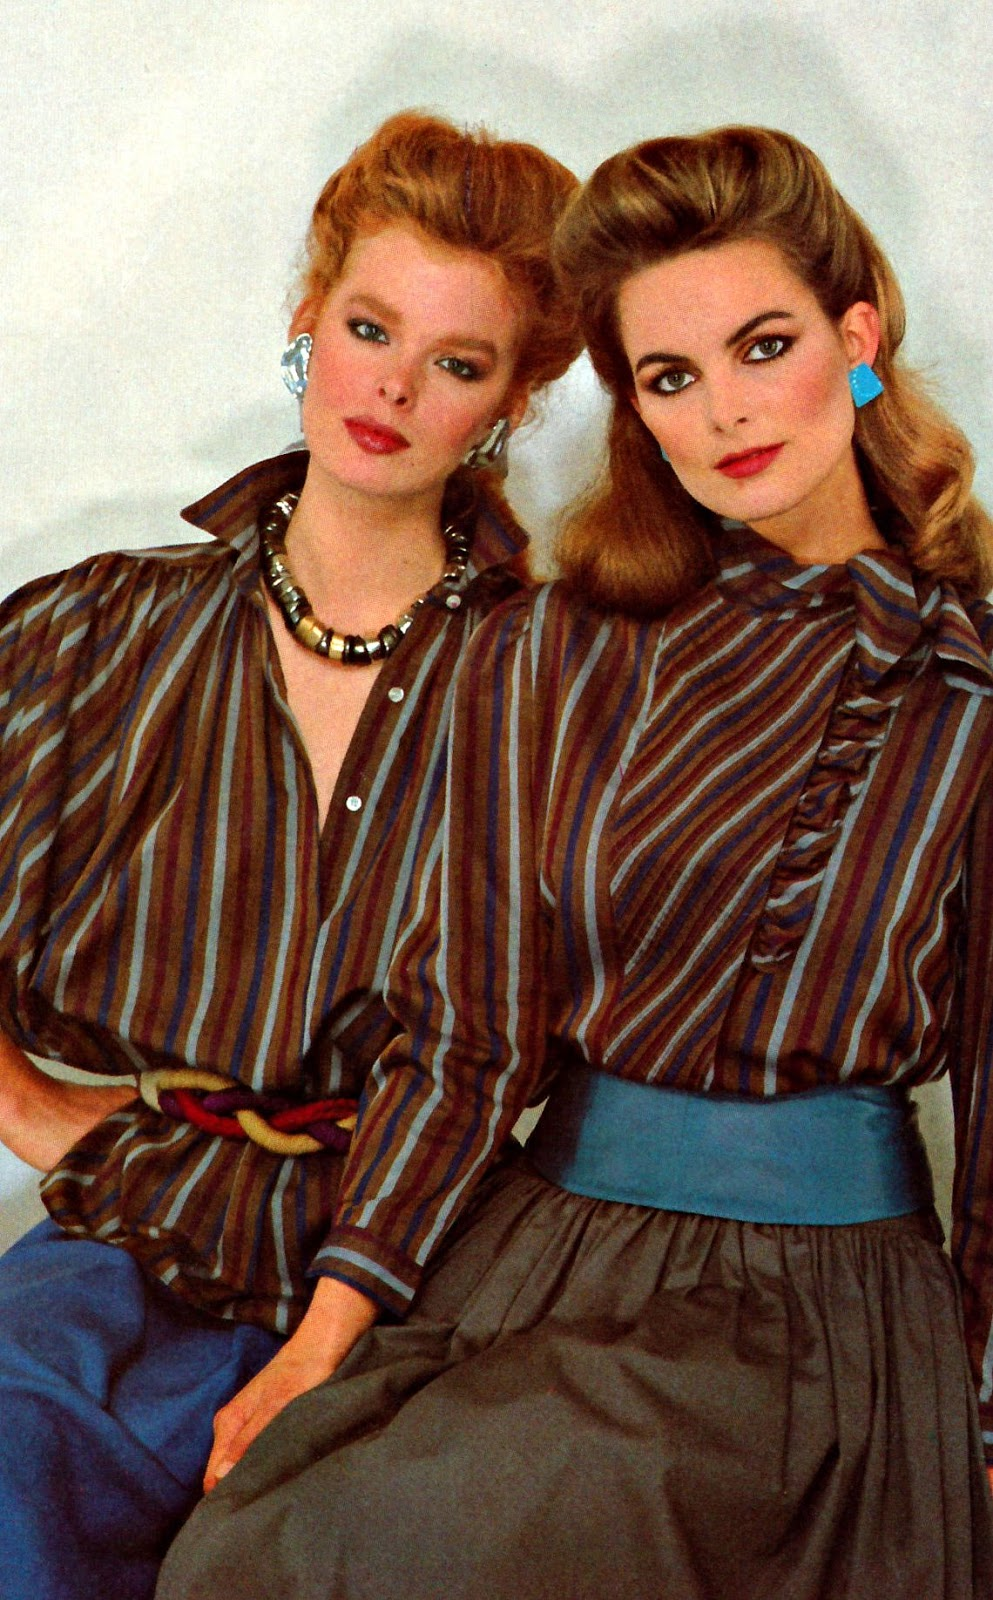 Princess Diana 1980s Fashion History and Style Icon 1980s business woman fashion